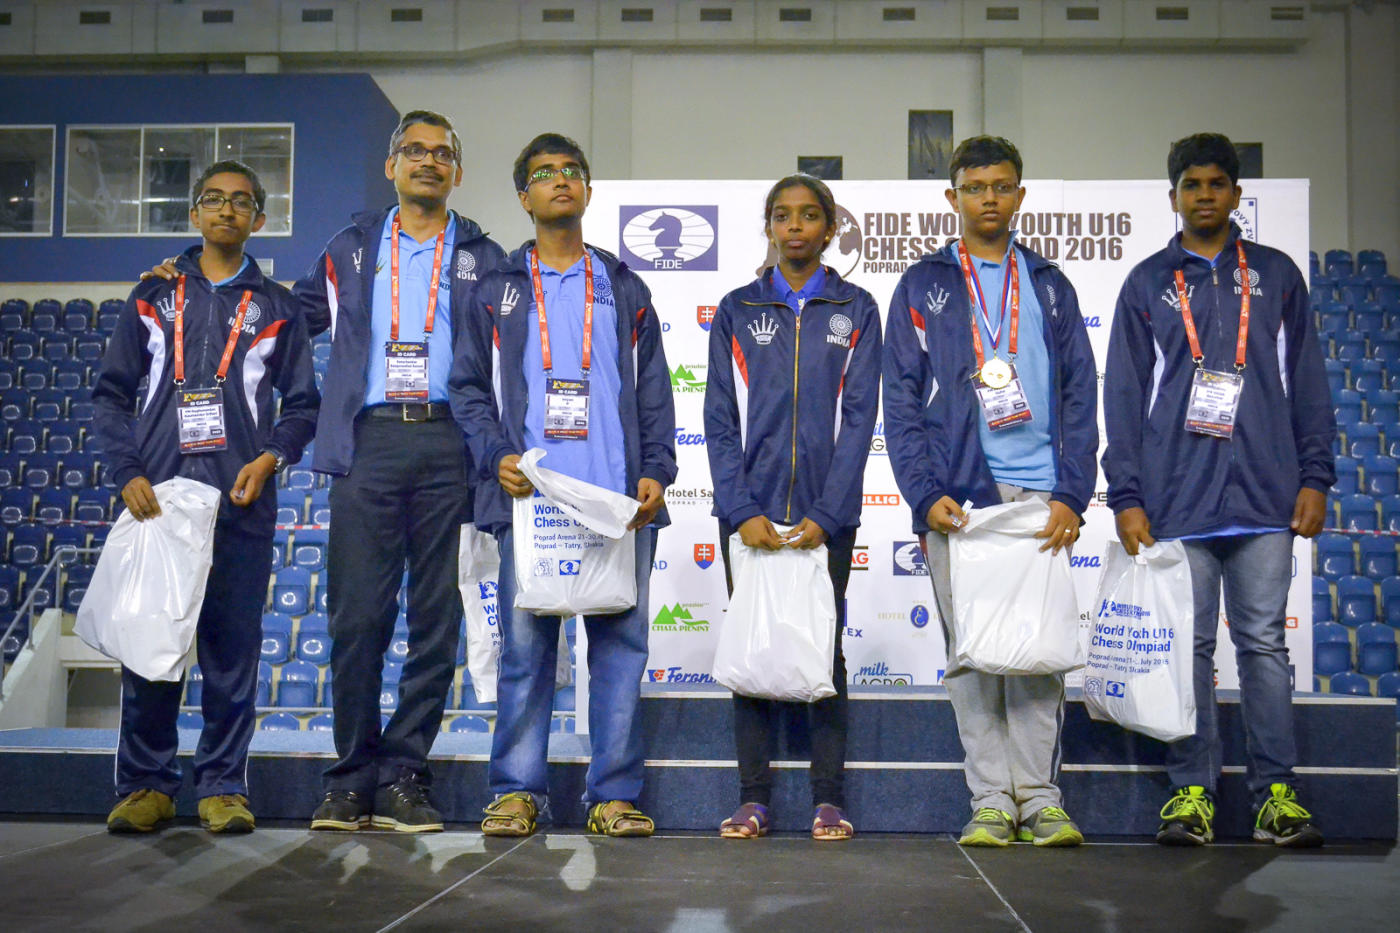 indian team photo